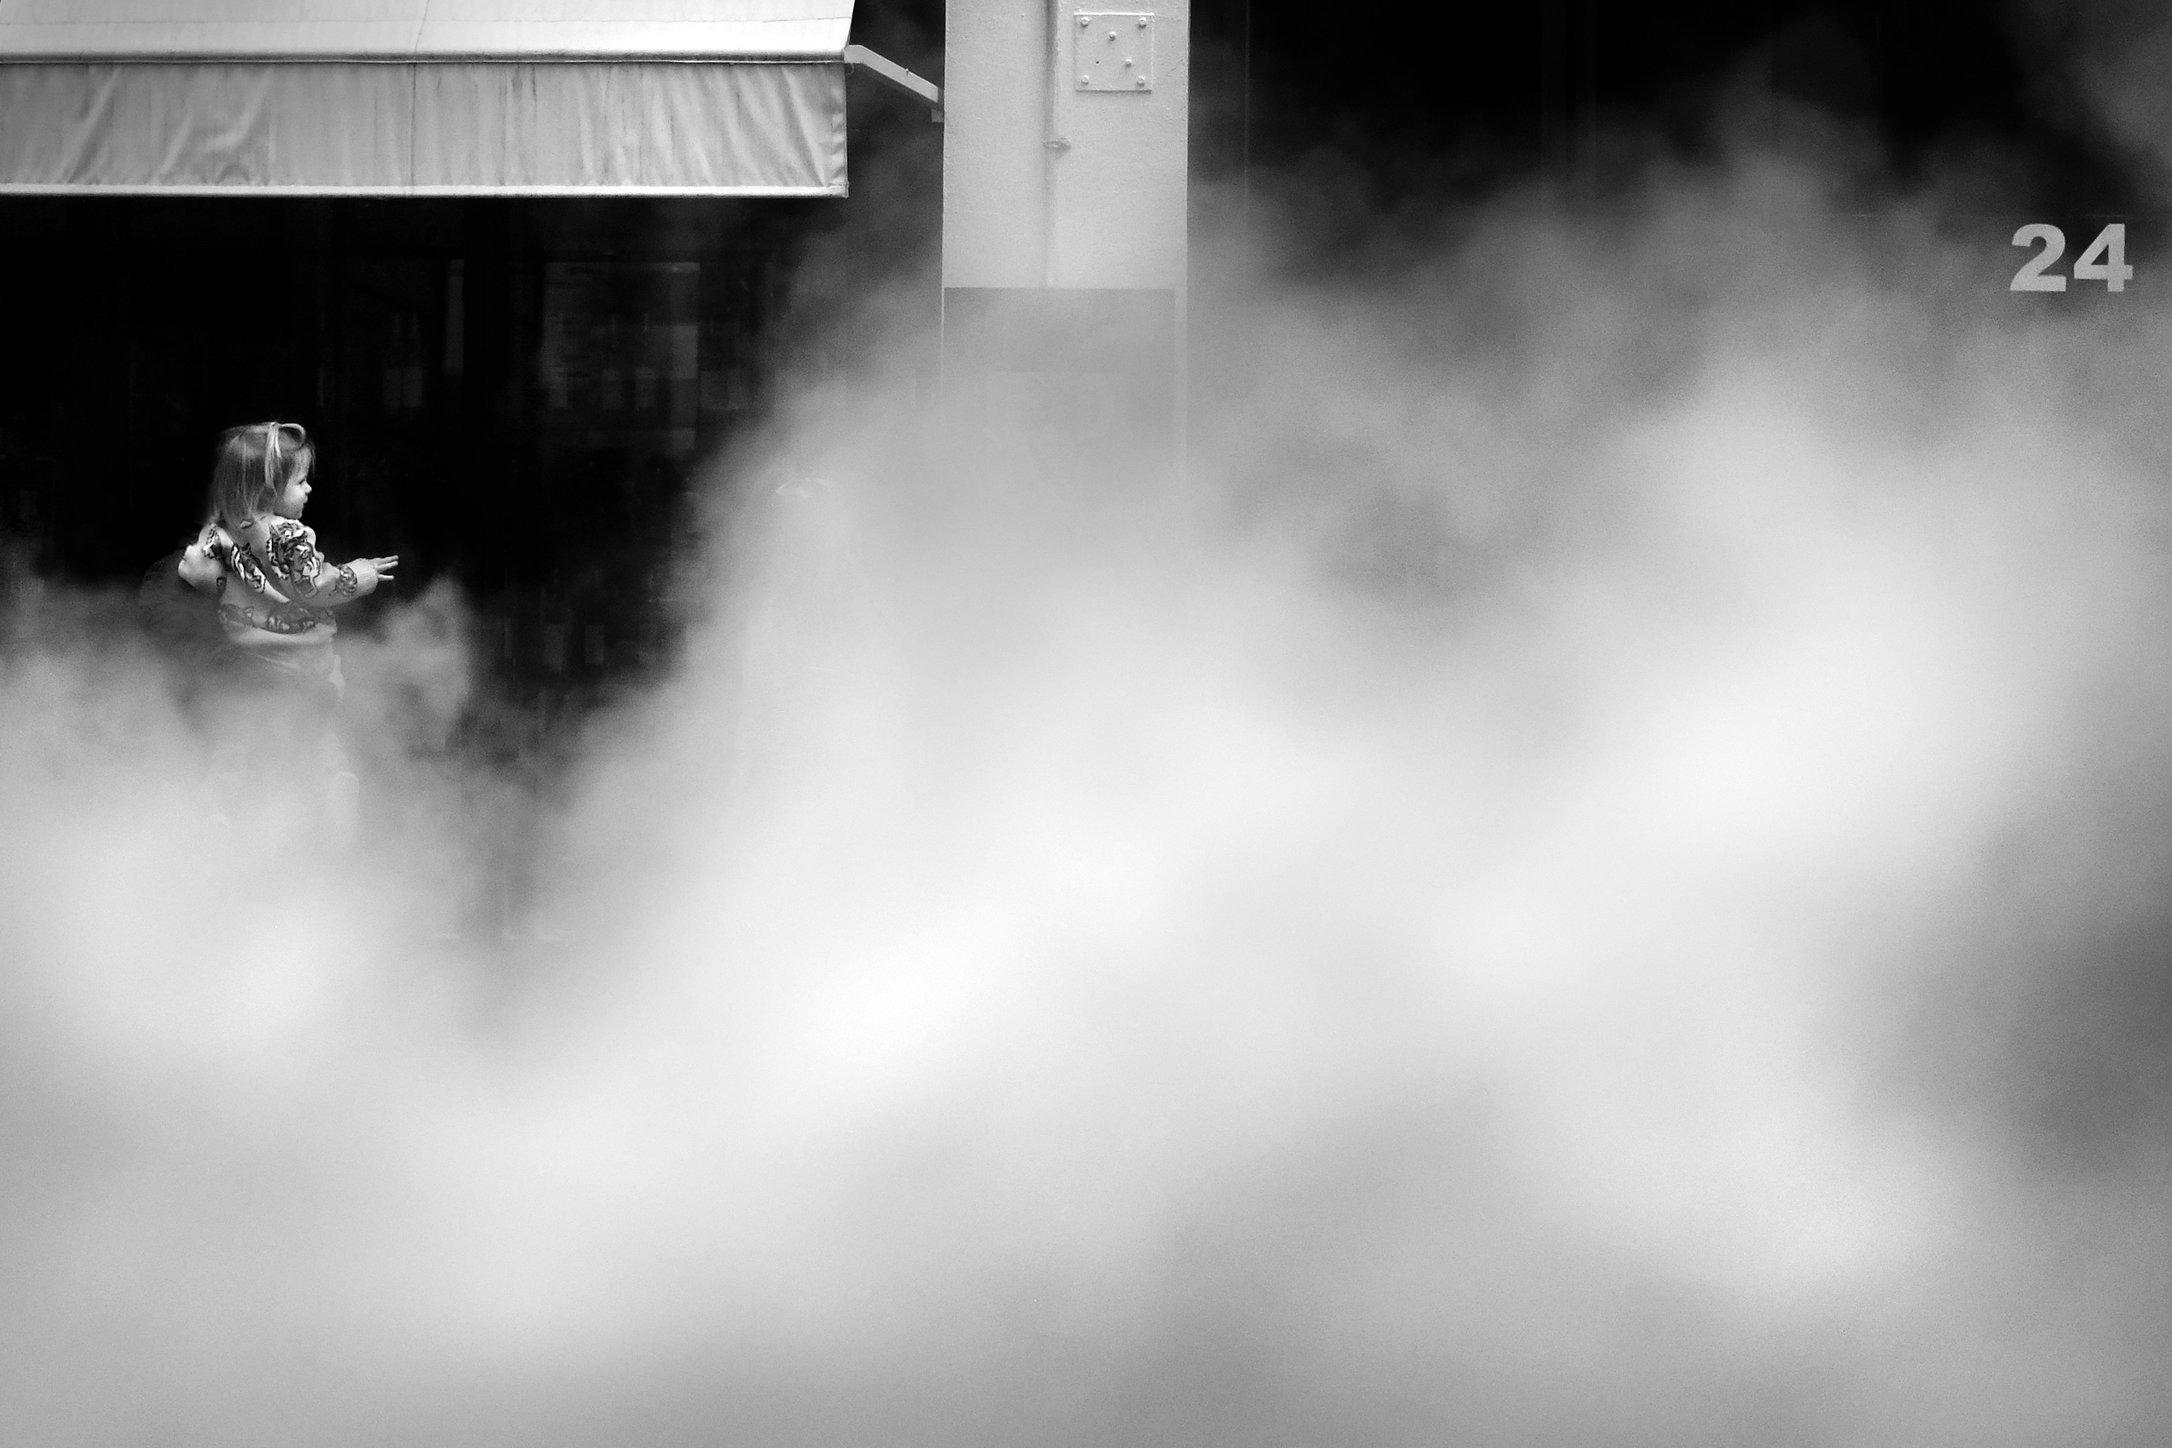 steam-24.jpg